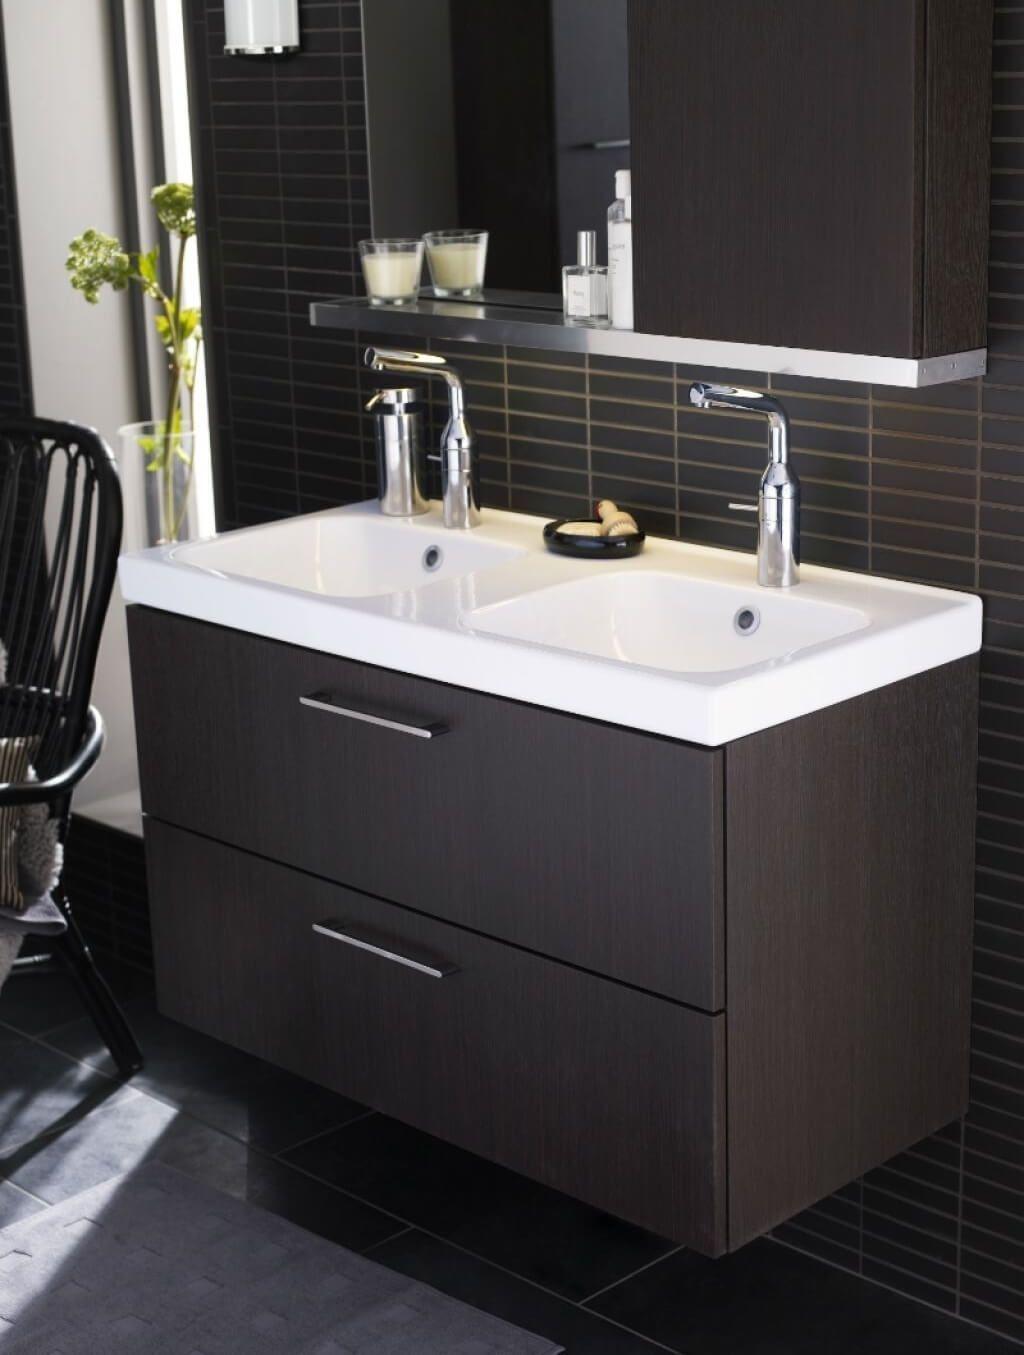 Ikea Badezimmer Waschbecken Schrank Ikea Badezimmer Minimalistisches Badezimmer Badezimmer Waschbecken